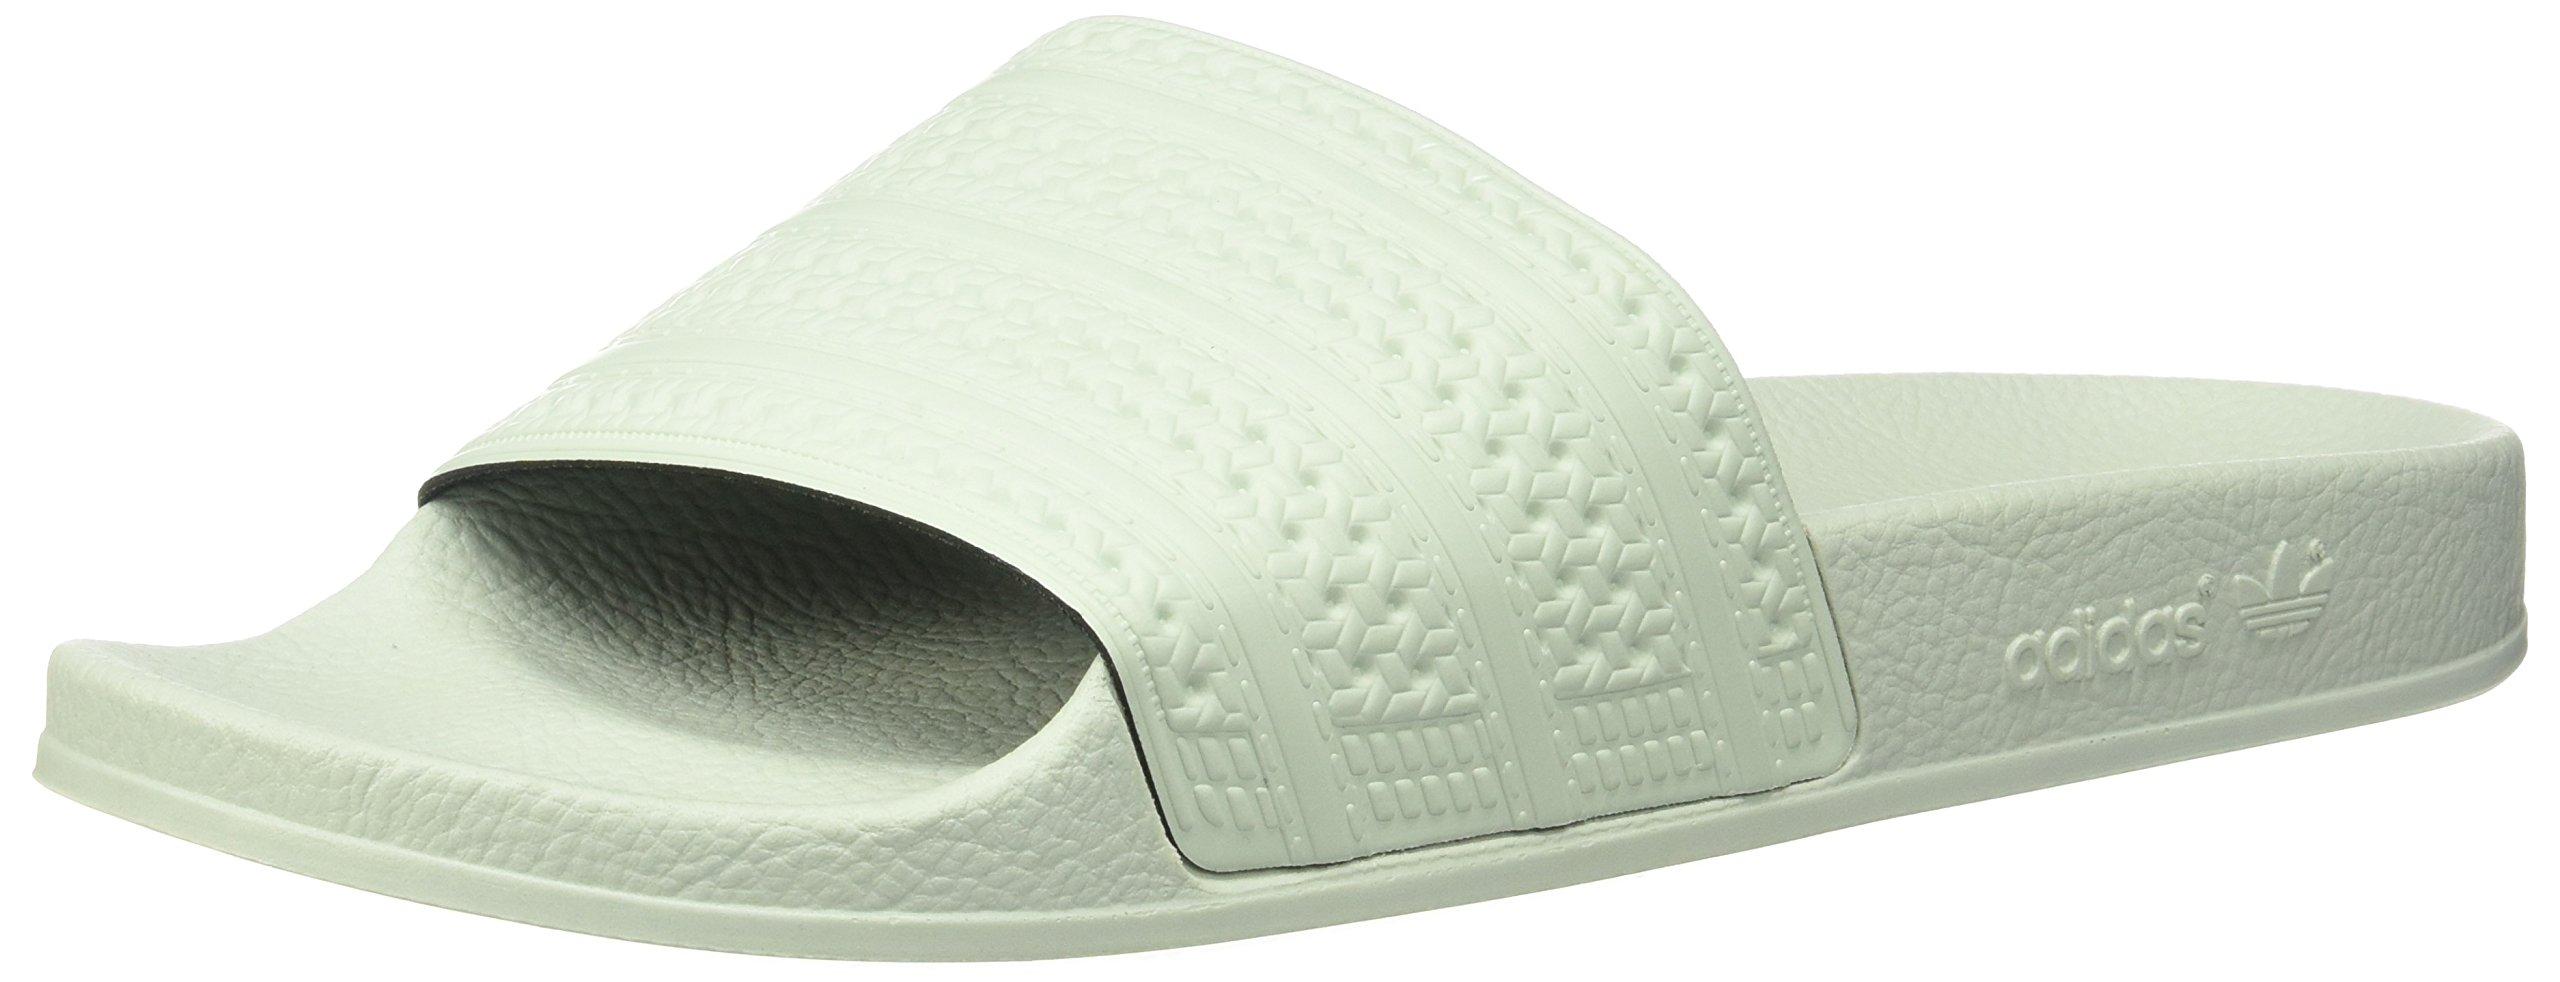 27bffe54ce9 adidas Originals Men s Adilette Slide Sandal Linen Green 5 M US ...